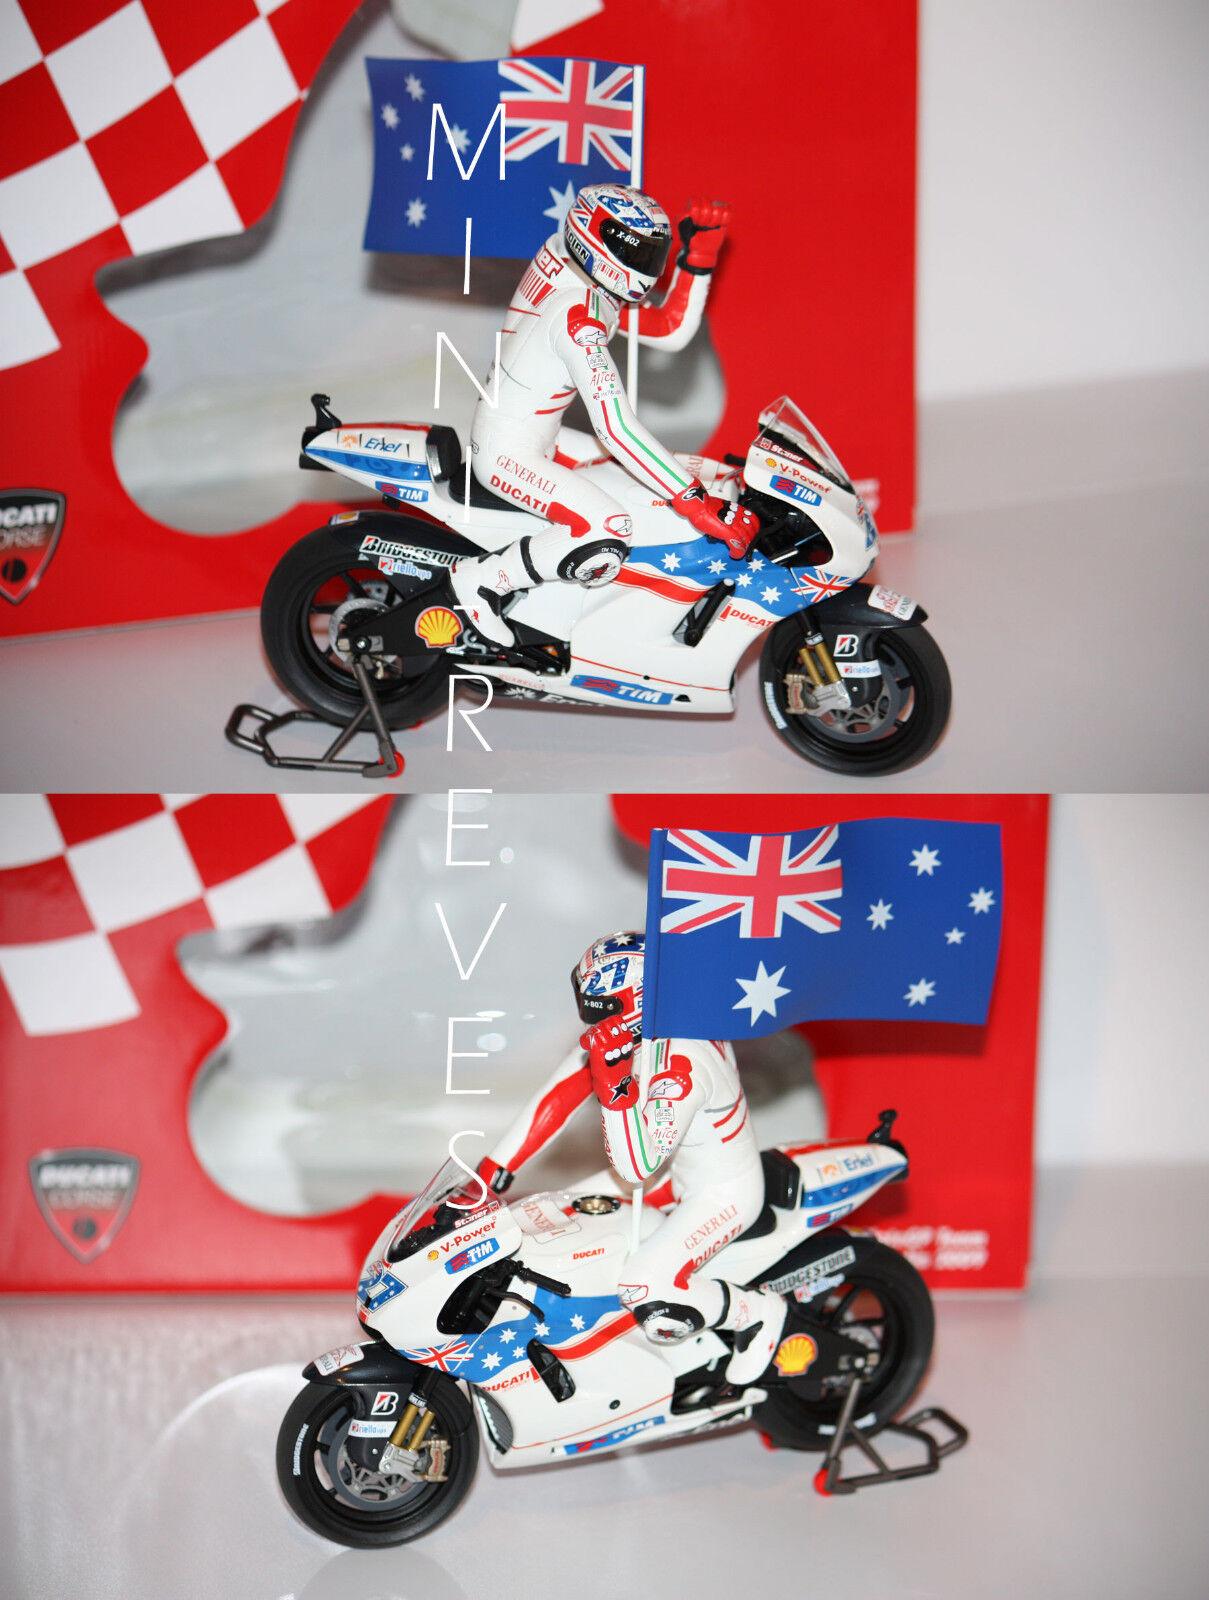 Minichamps MotoGP Ducati Desmocedici GP09 2009 C. Stoner 1 12 122090127